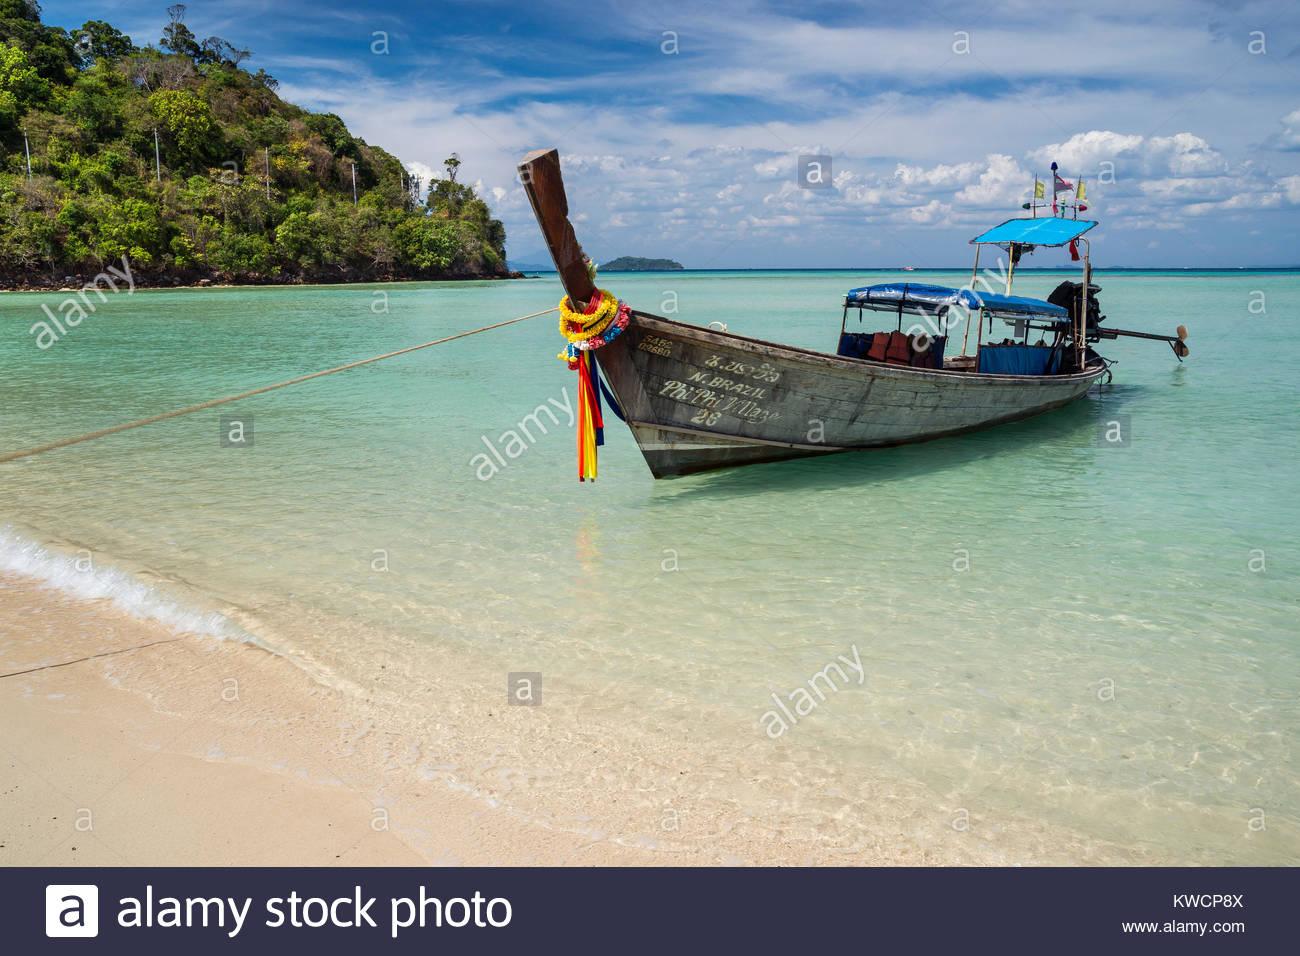 Long tail boat in Loh Bagao Bay - Koh Phi Phi Don - Thailand Stock Photo